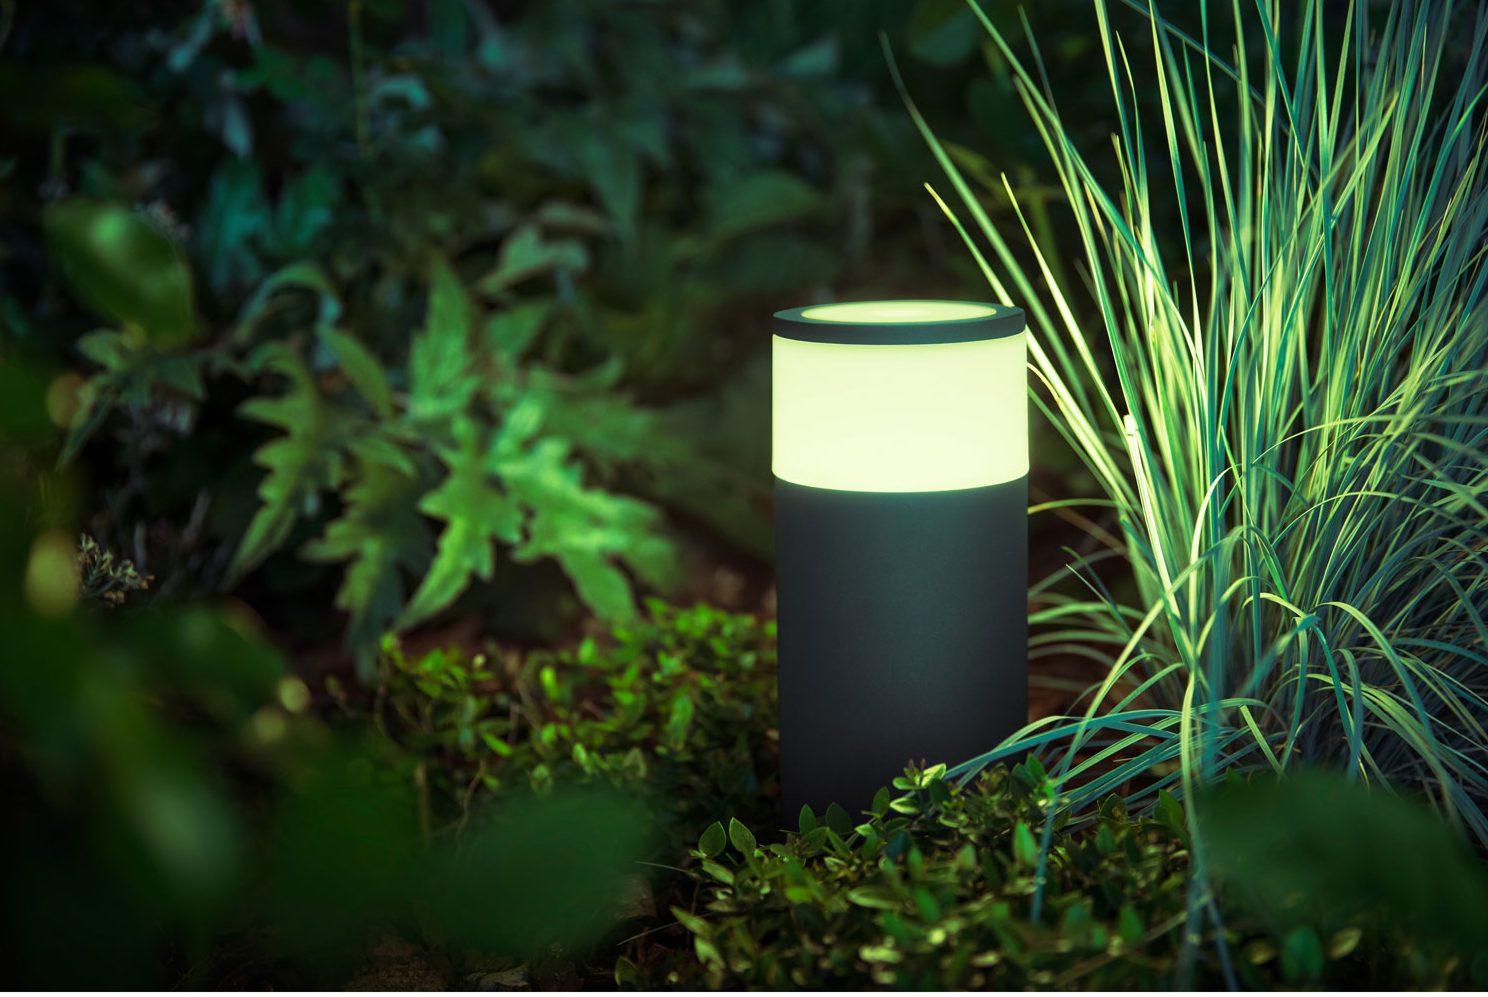 lampes d'extérieur Hue de Philips - calla